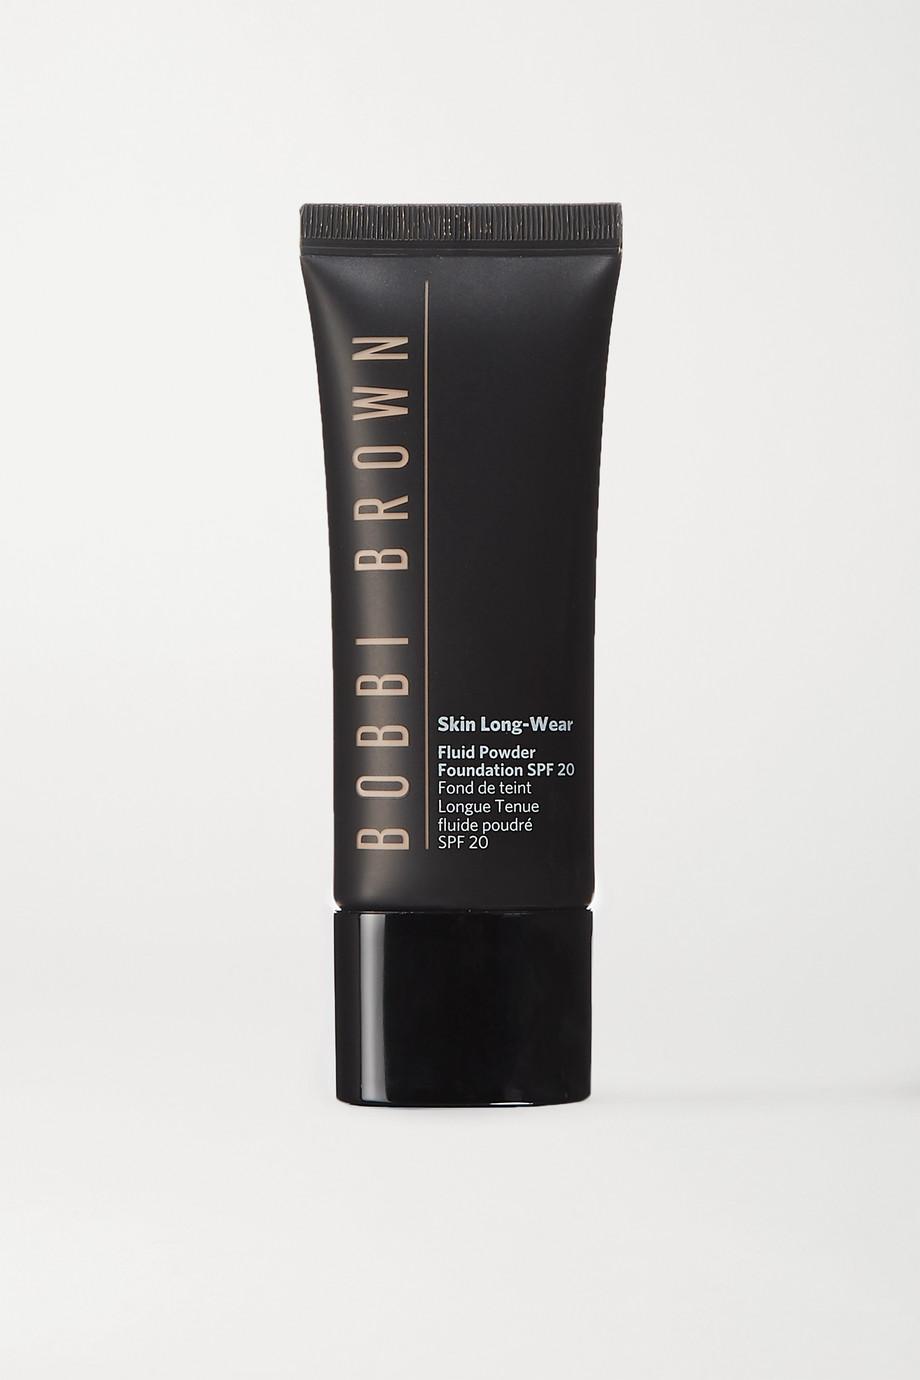 Bobbi Brown Skin Long-Wear Fluid Powder Foundation SPF20 - Warm Beige